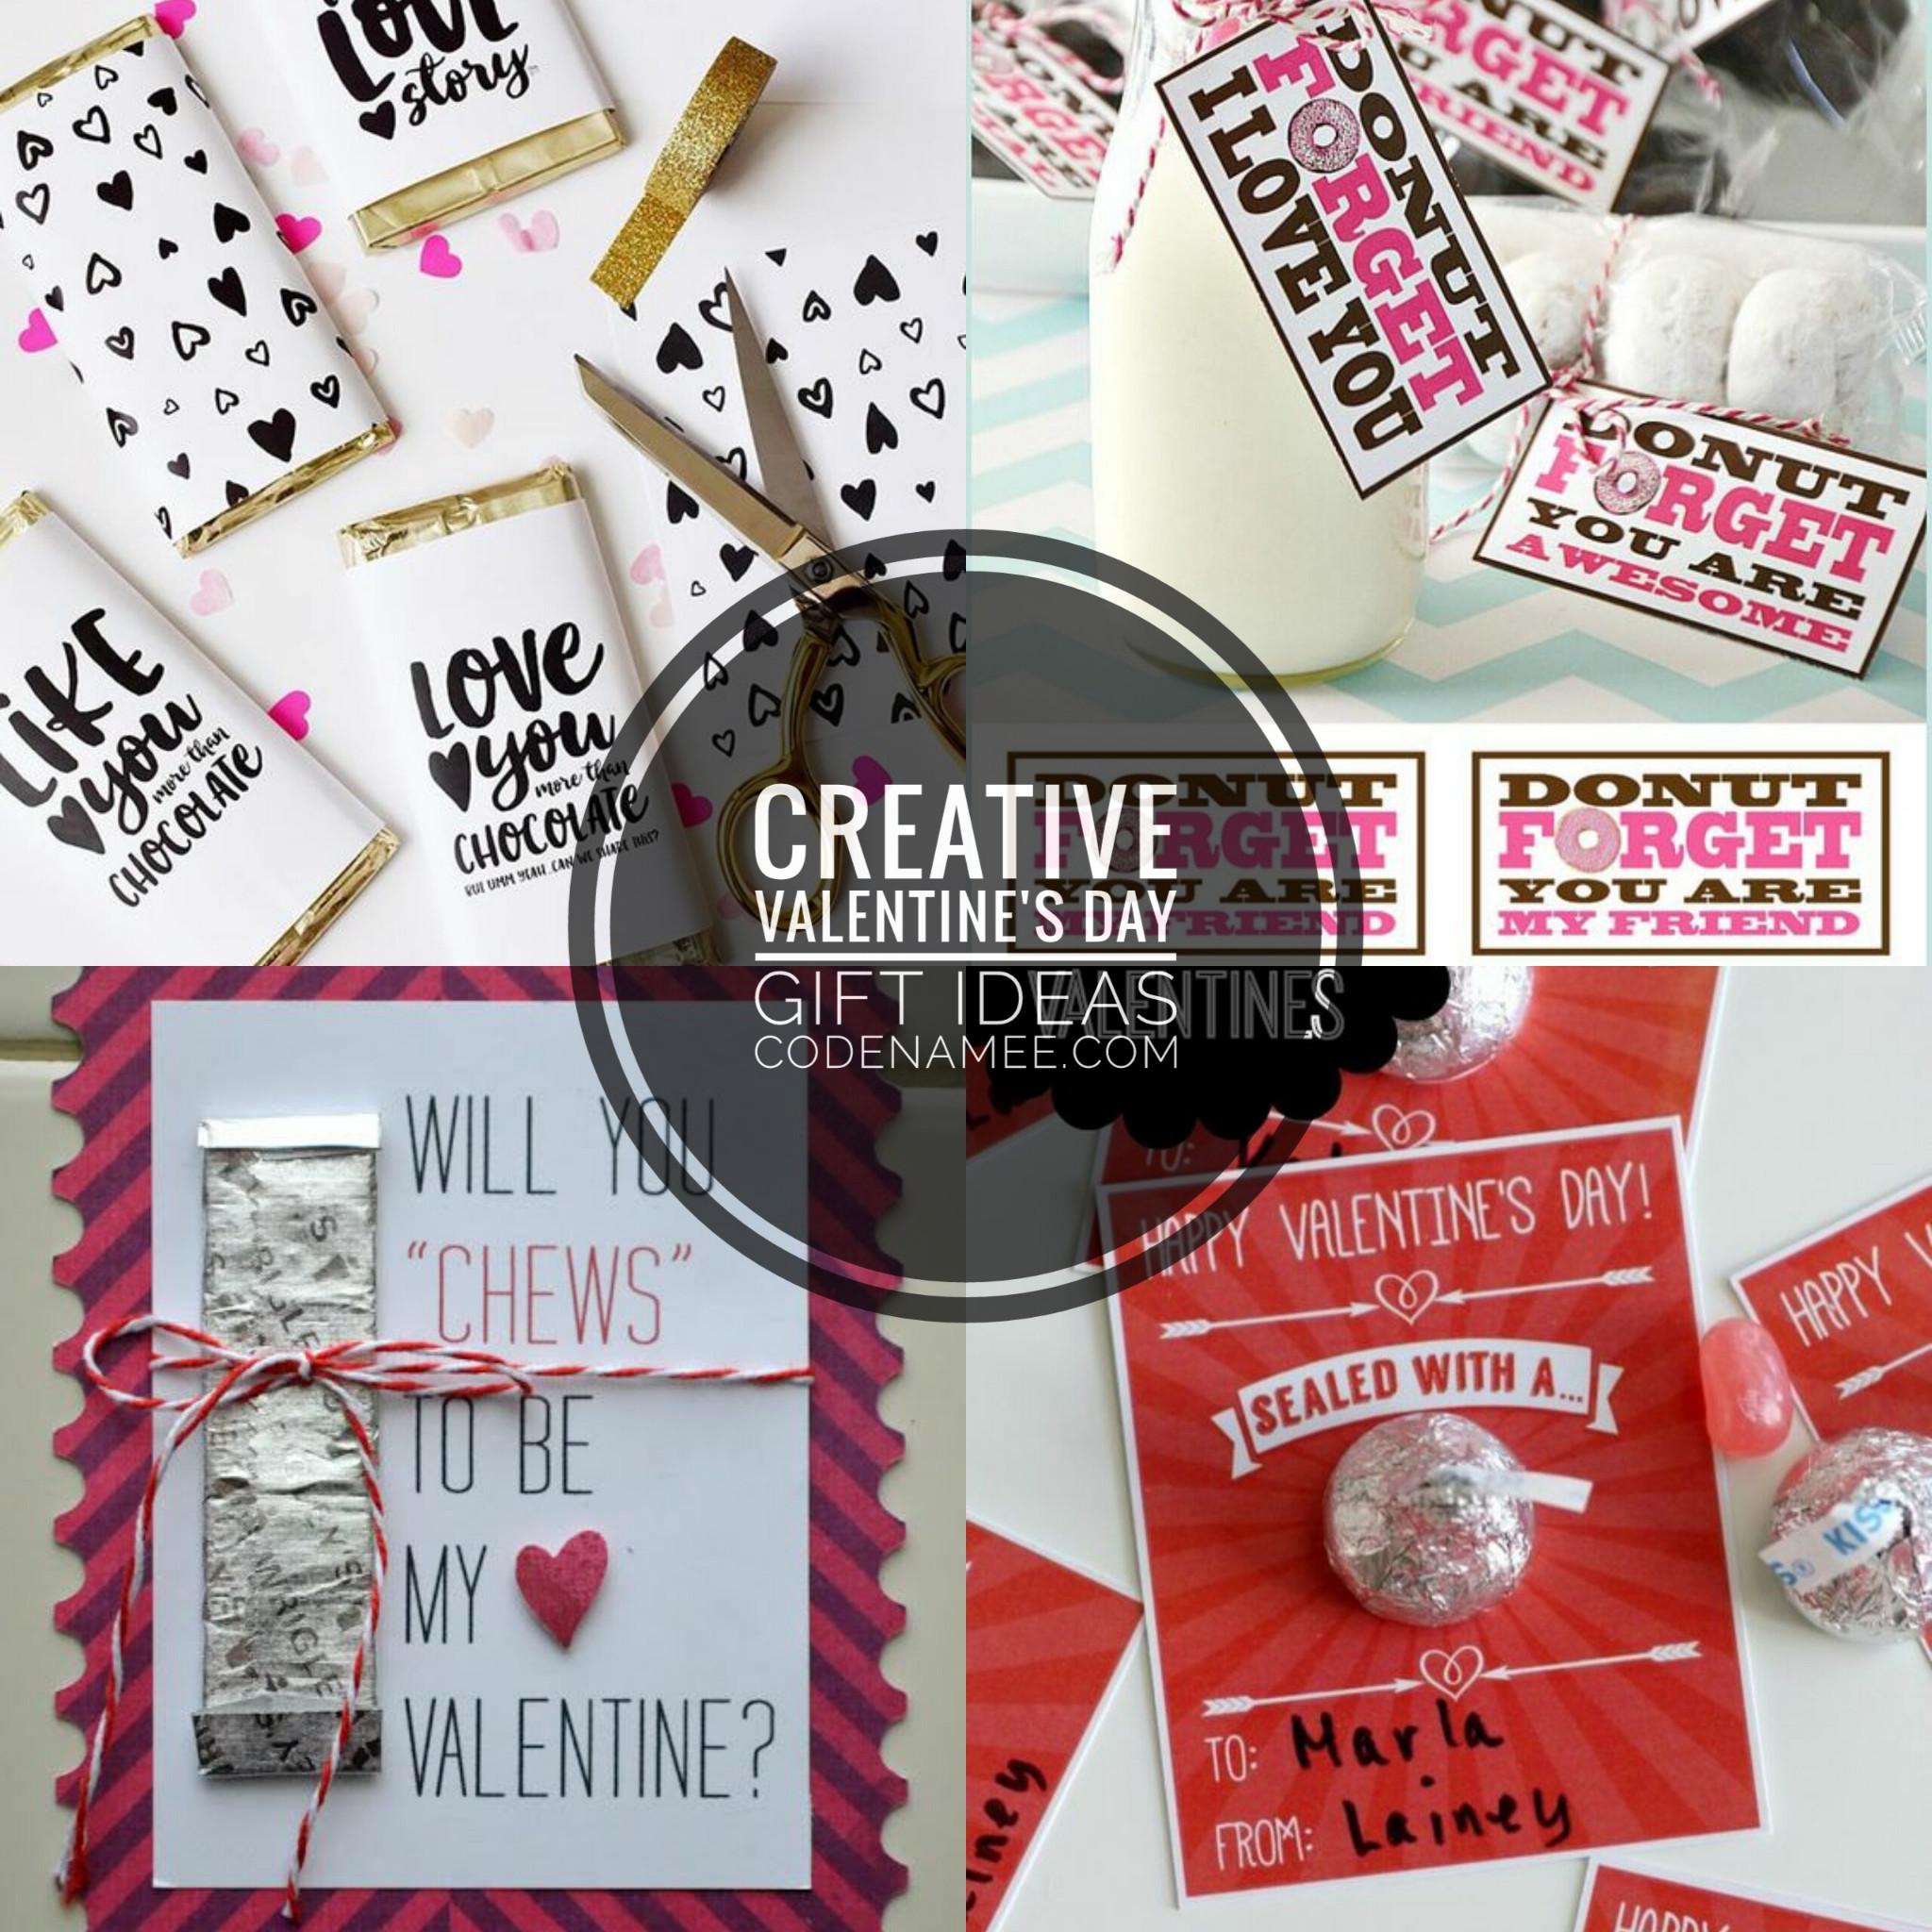 Valentines Creative Gift Ideas  24 DIY Creative Gift Ideas for Valentine's Day